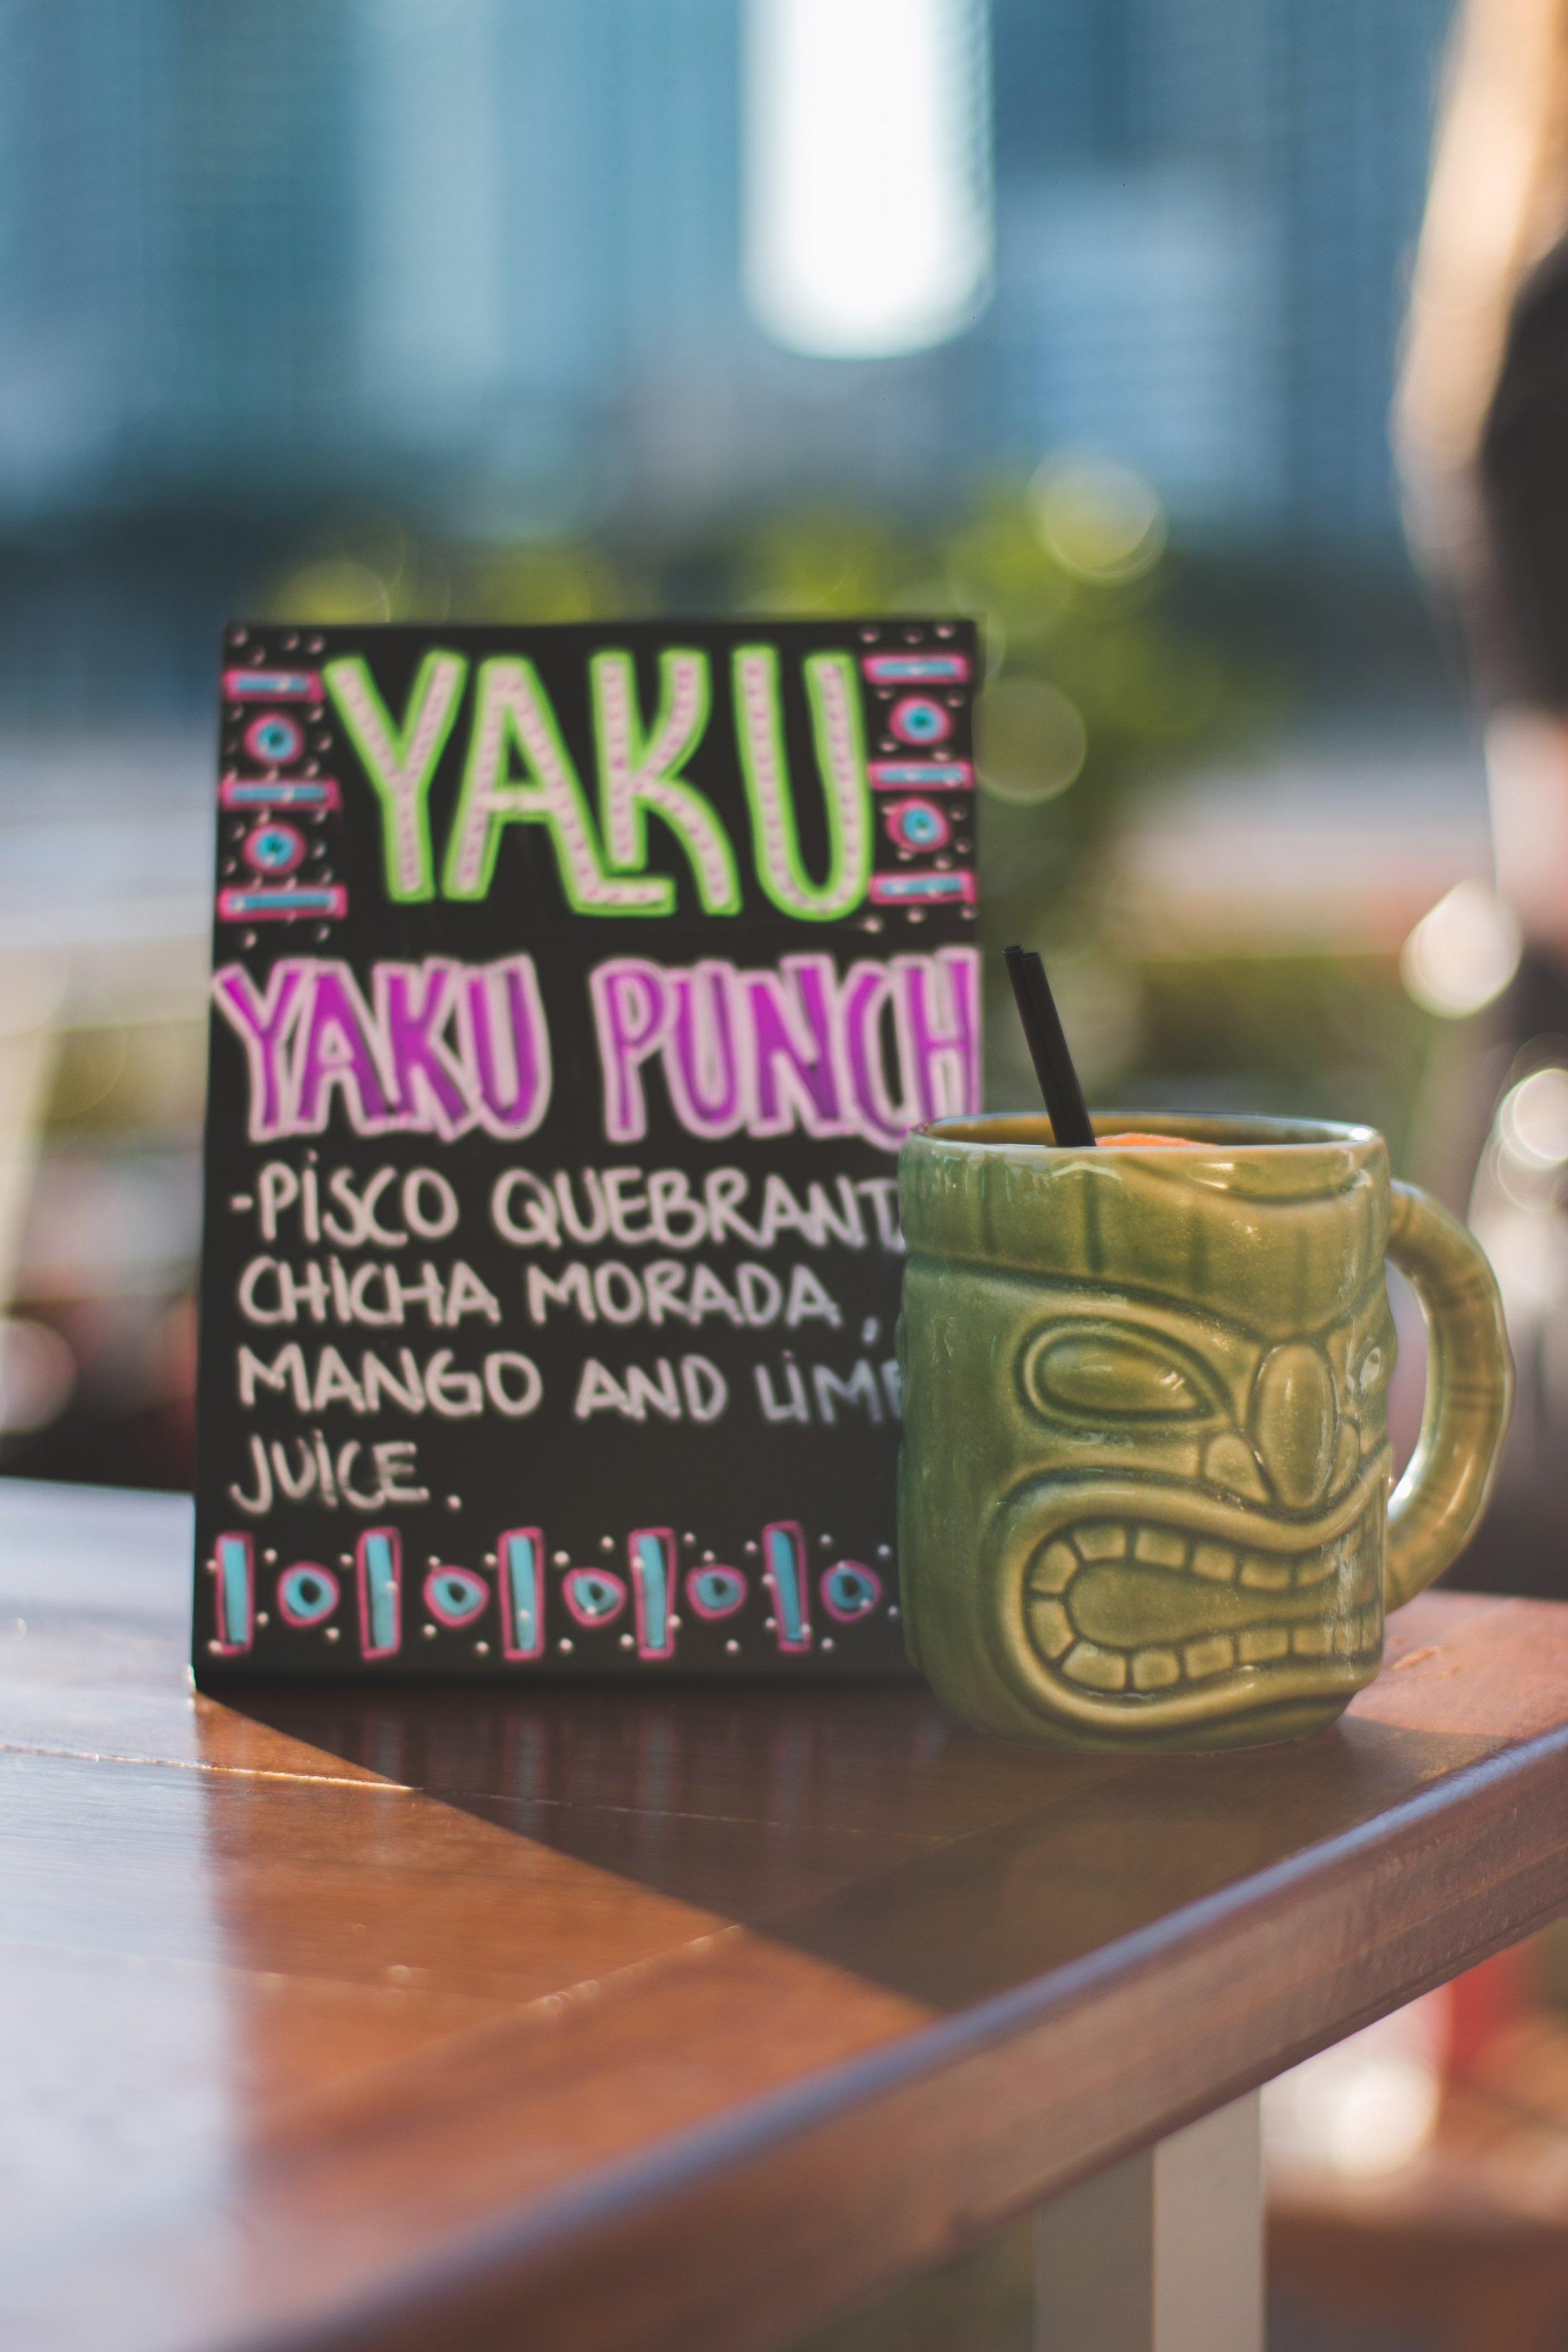 yaku cocktail.jpg